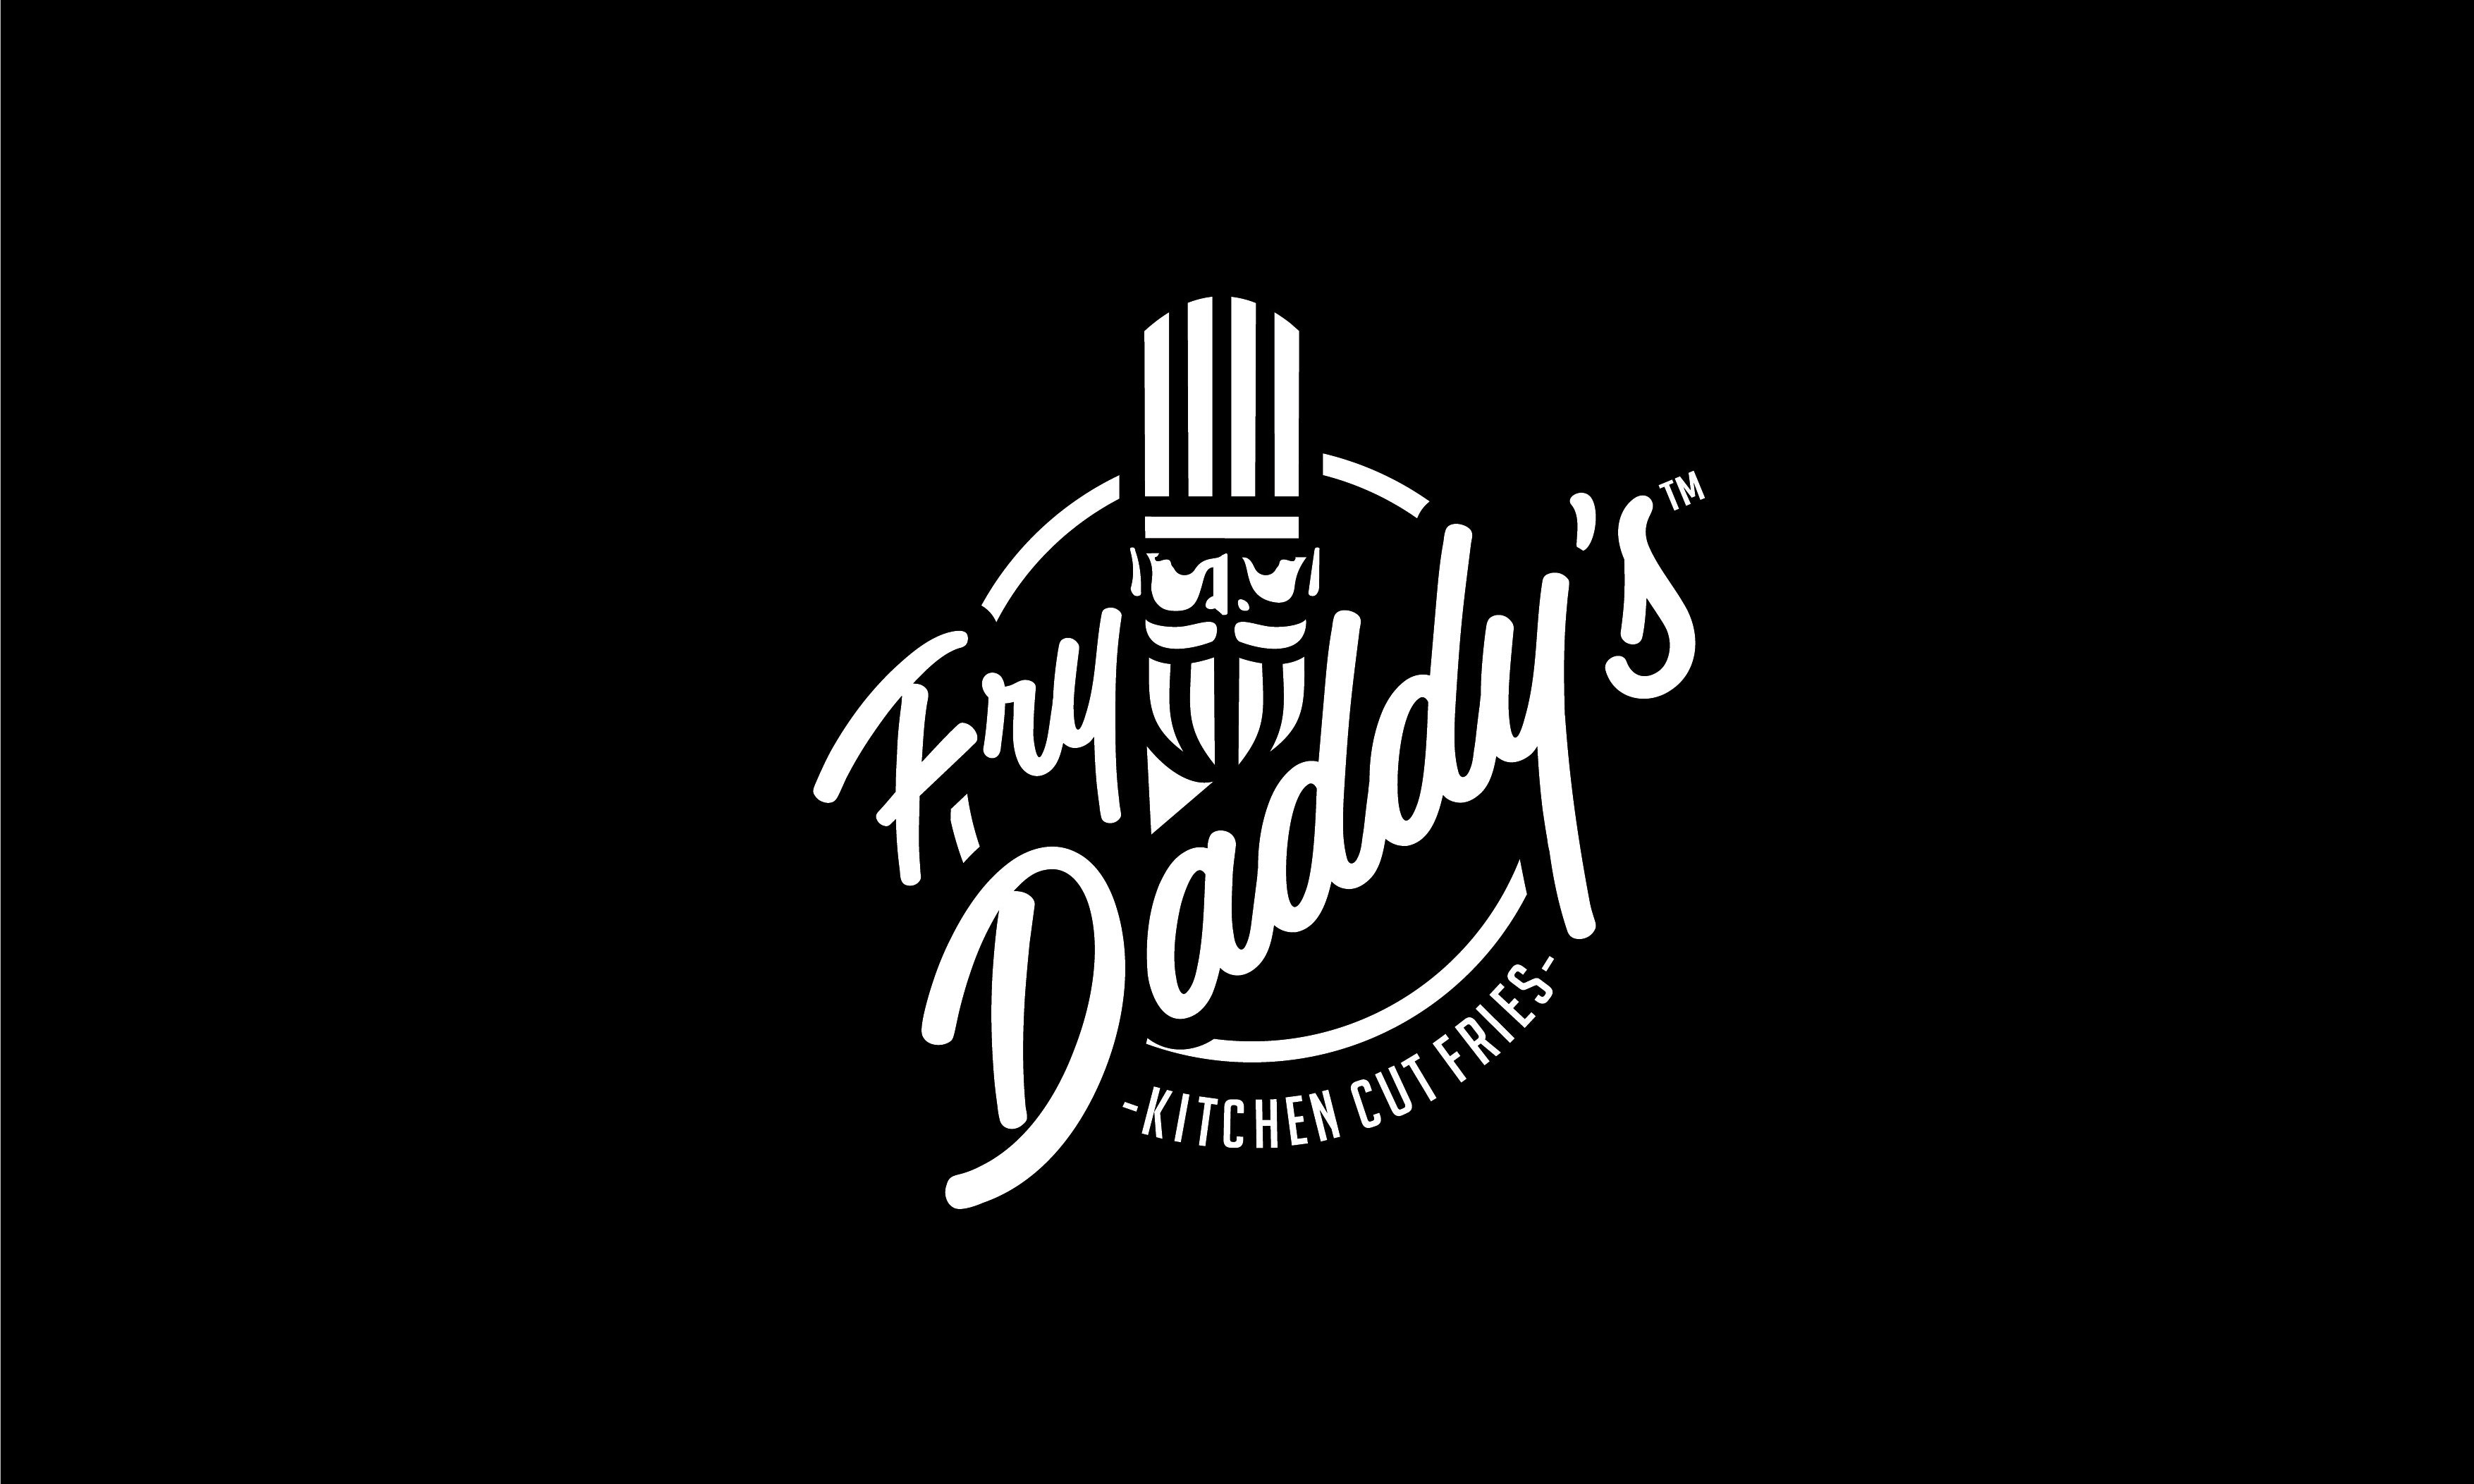 Fry Daddys logo